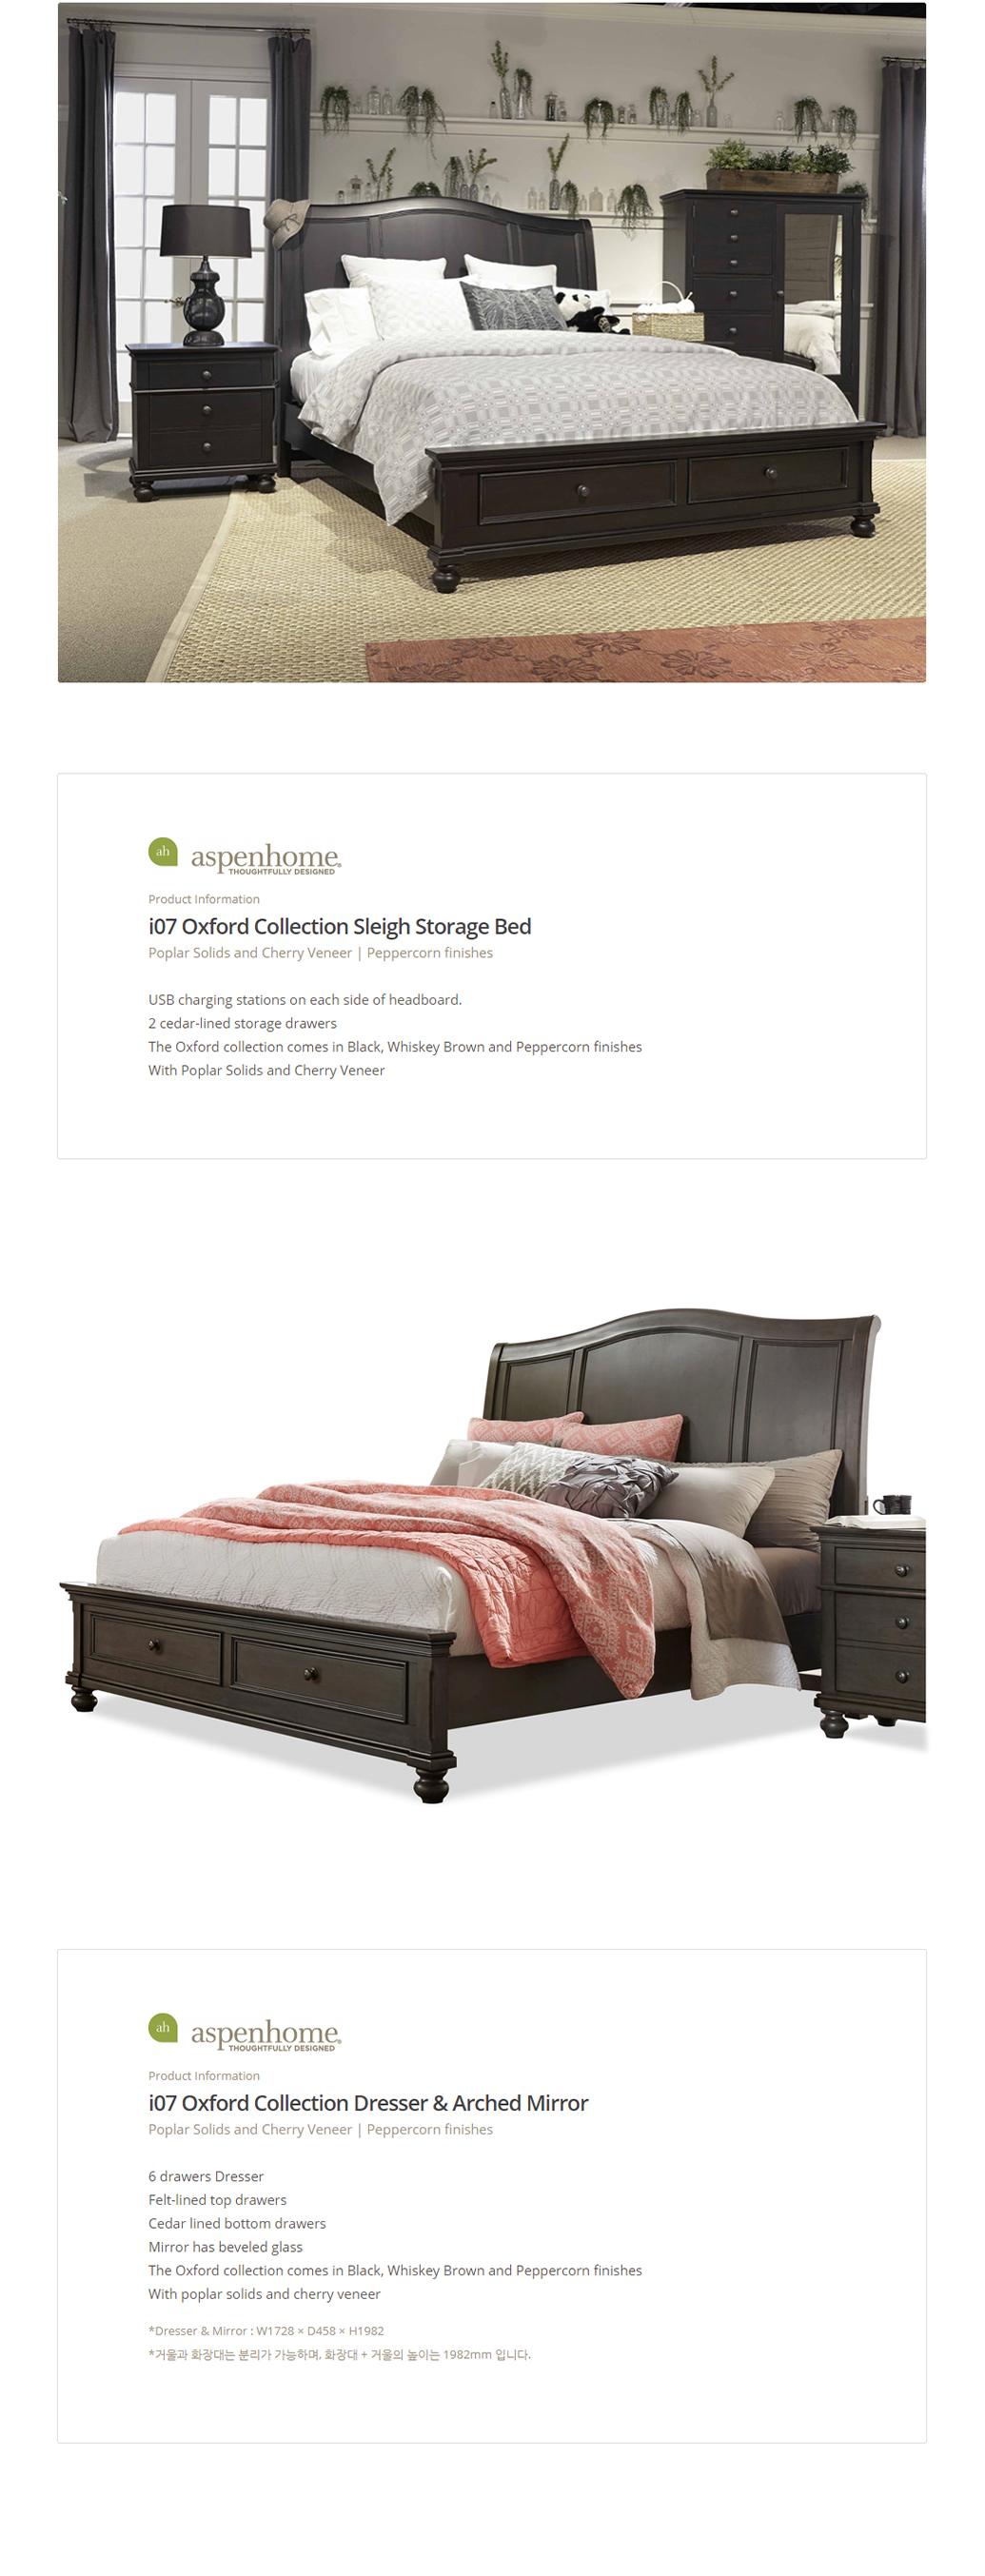 i07_oxford_bedroom_peppercorn_02.jpg